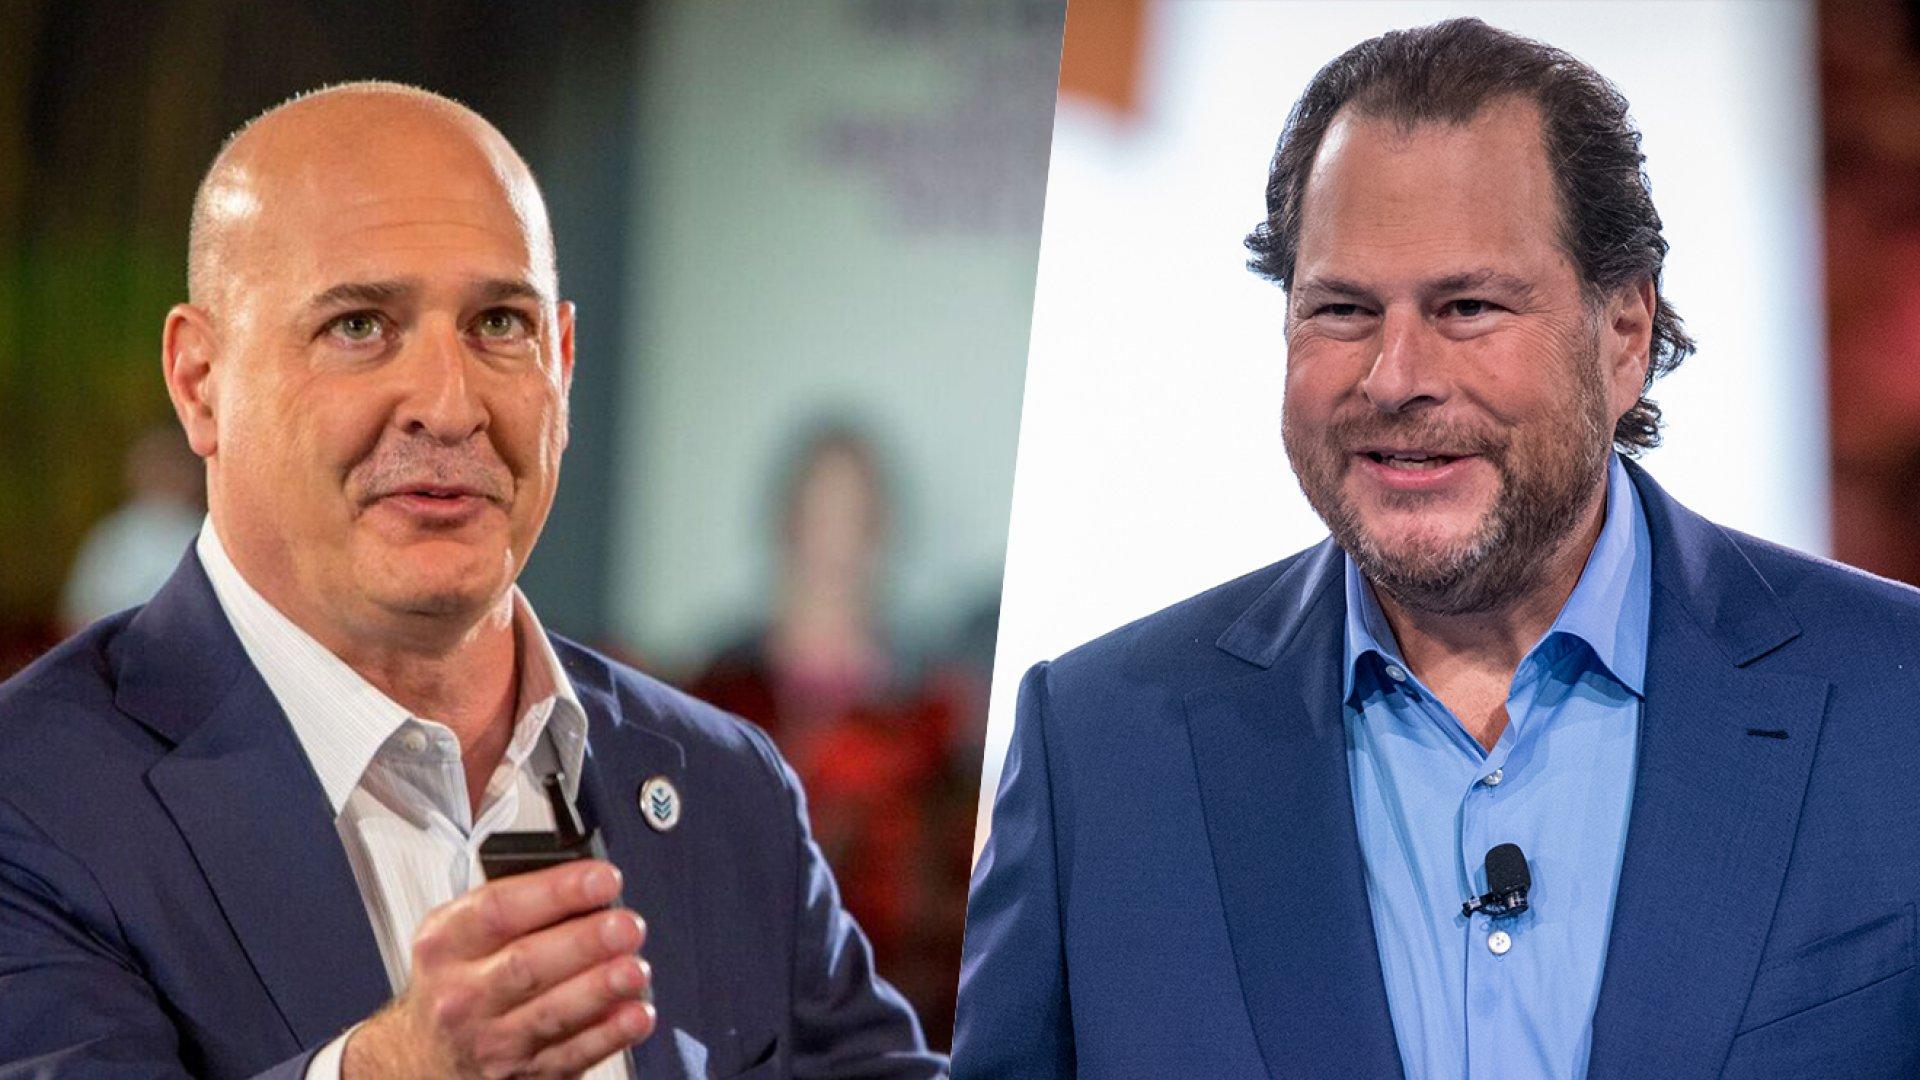 Salesforce co-CEOs Keith Block (left) and Marc Benioff.